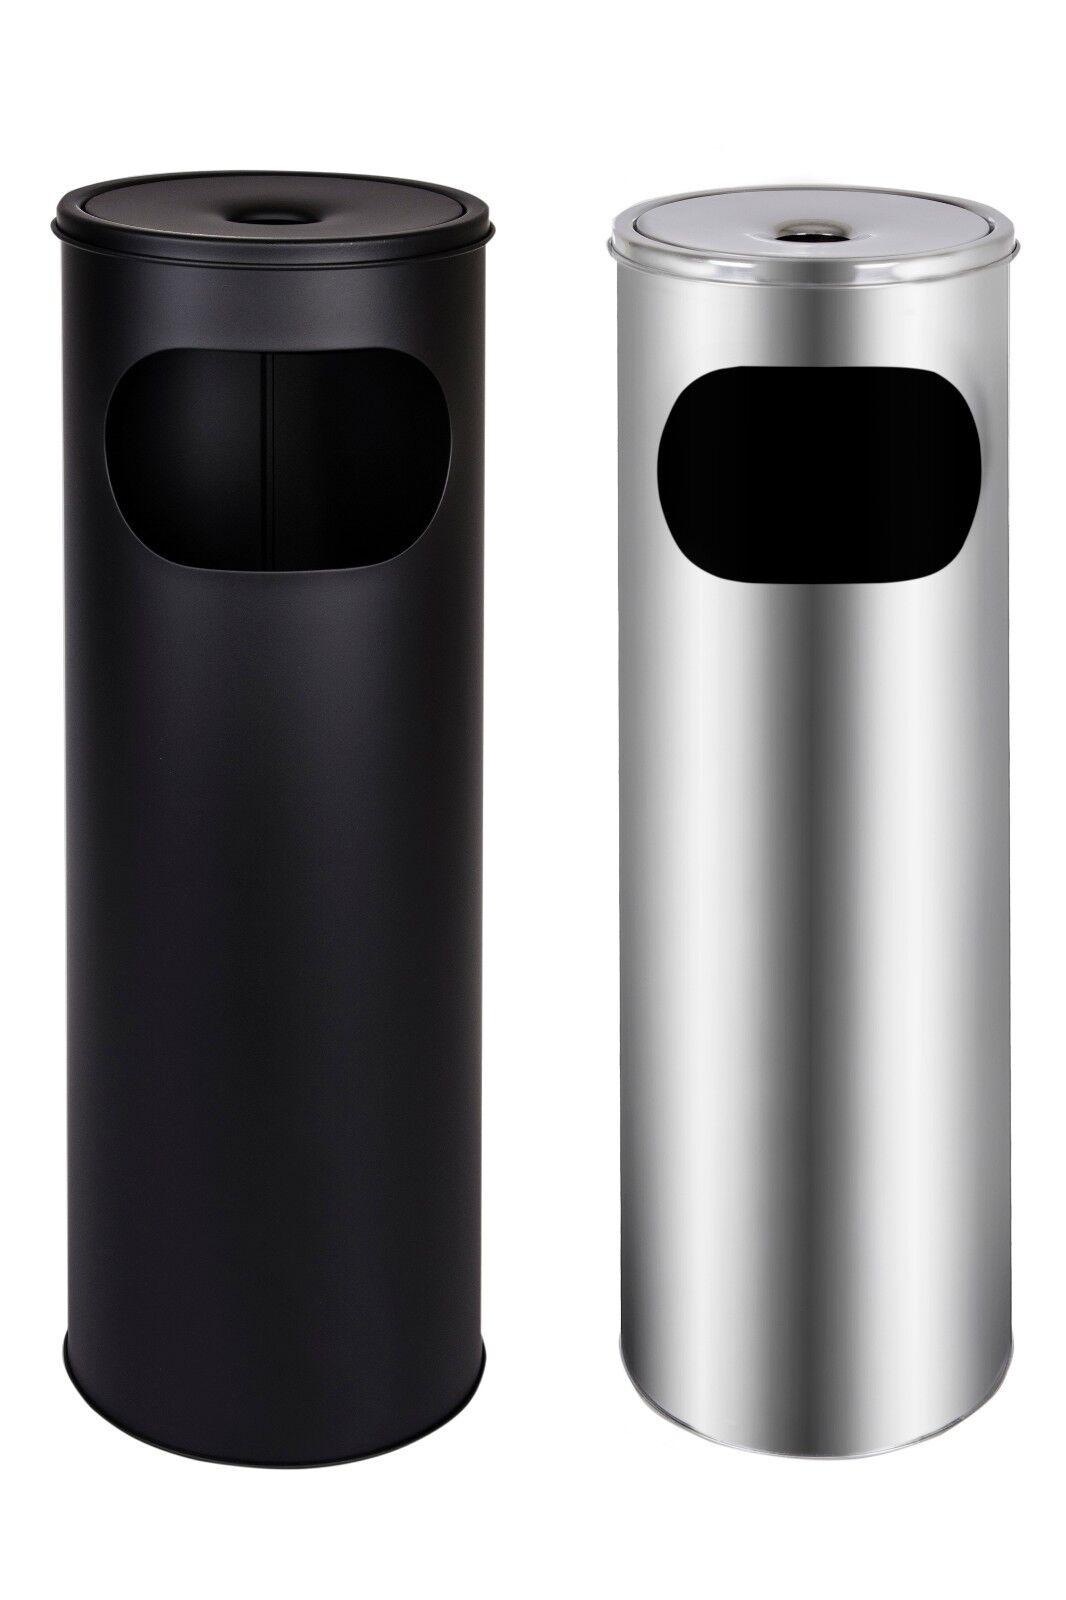 Standaschenbecher Mülleimer Edelstahl Aschenbecher Schwarz Silber 58cm 18L